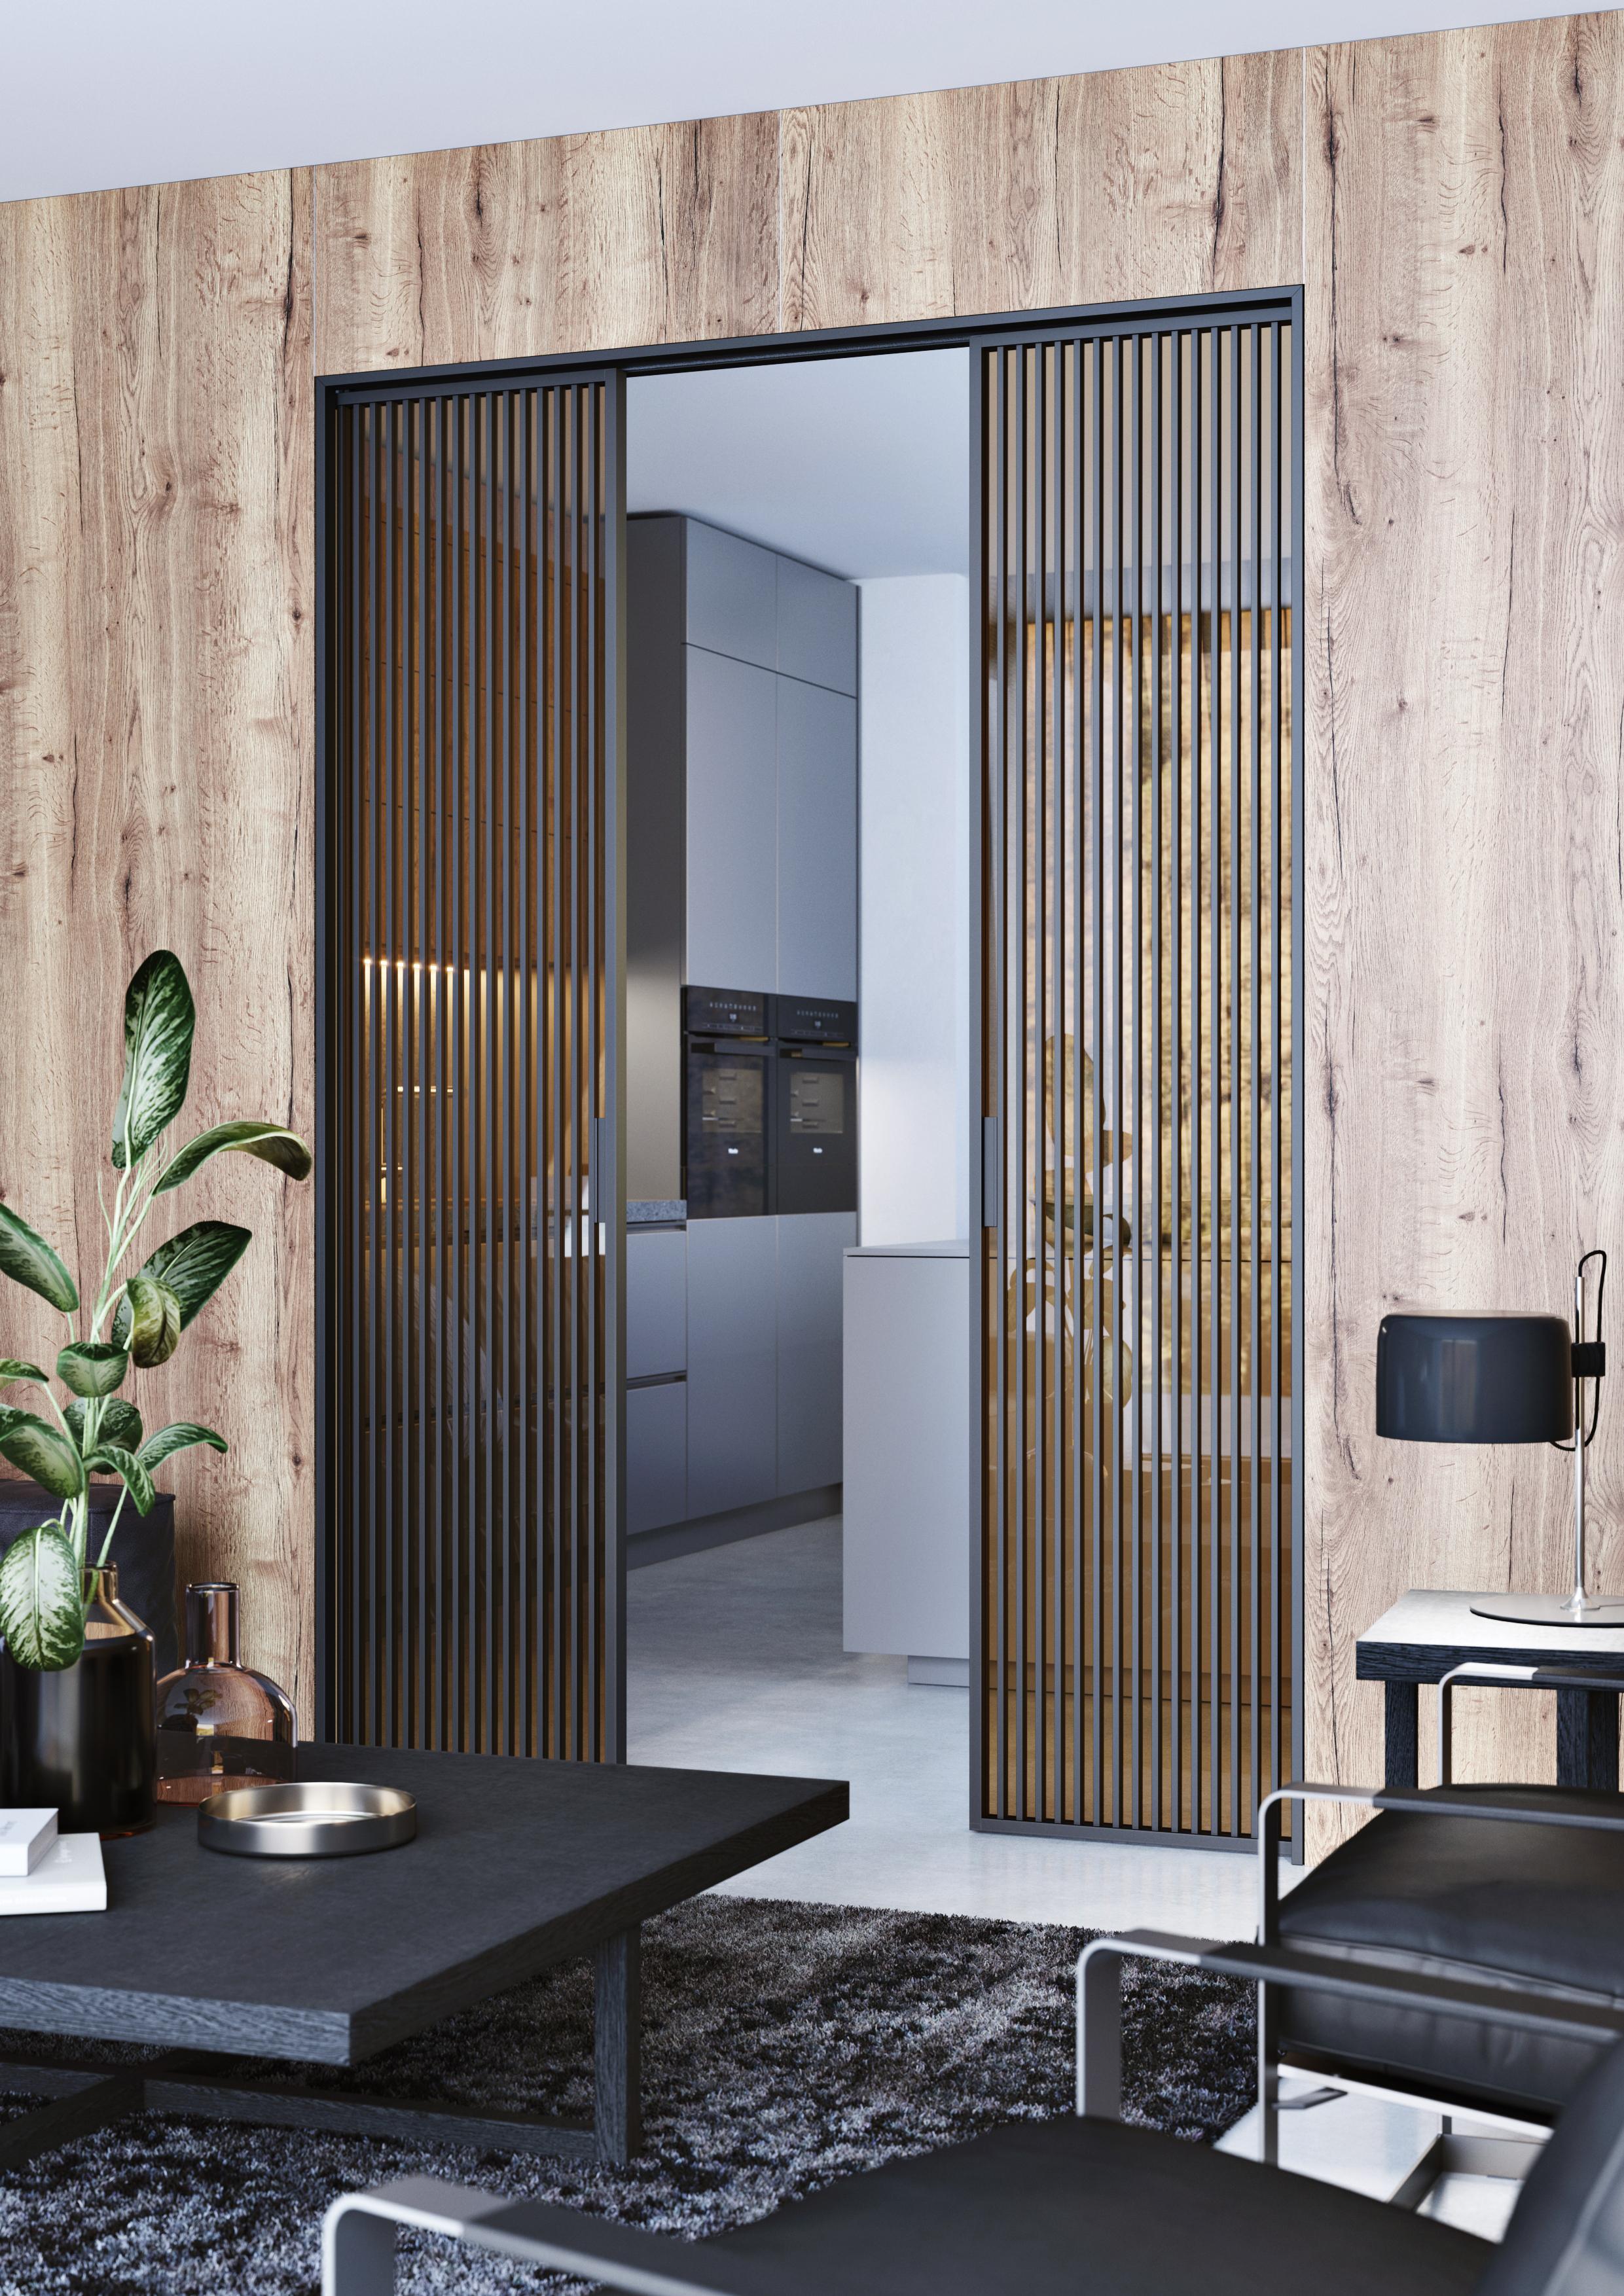 dvere IDEALINE Vertical sklo planibel bronz stavebni pouzdro EMOTIVE KOMFORT foto zdroj JAP FUTURE